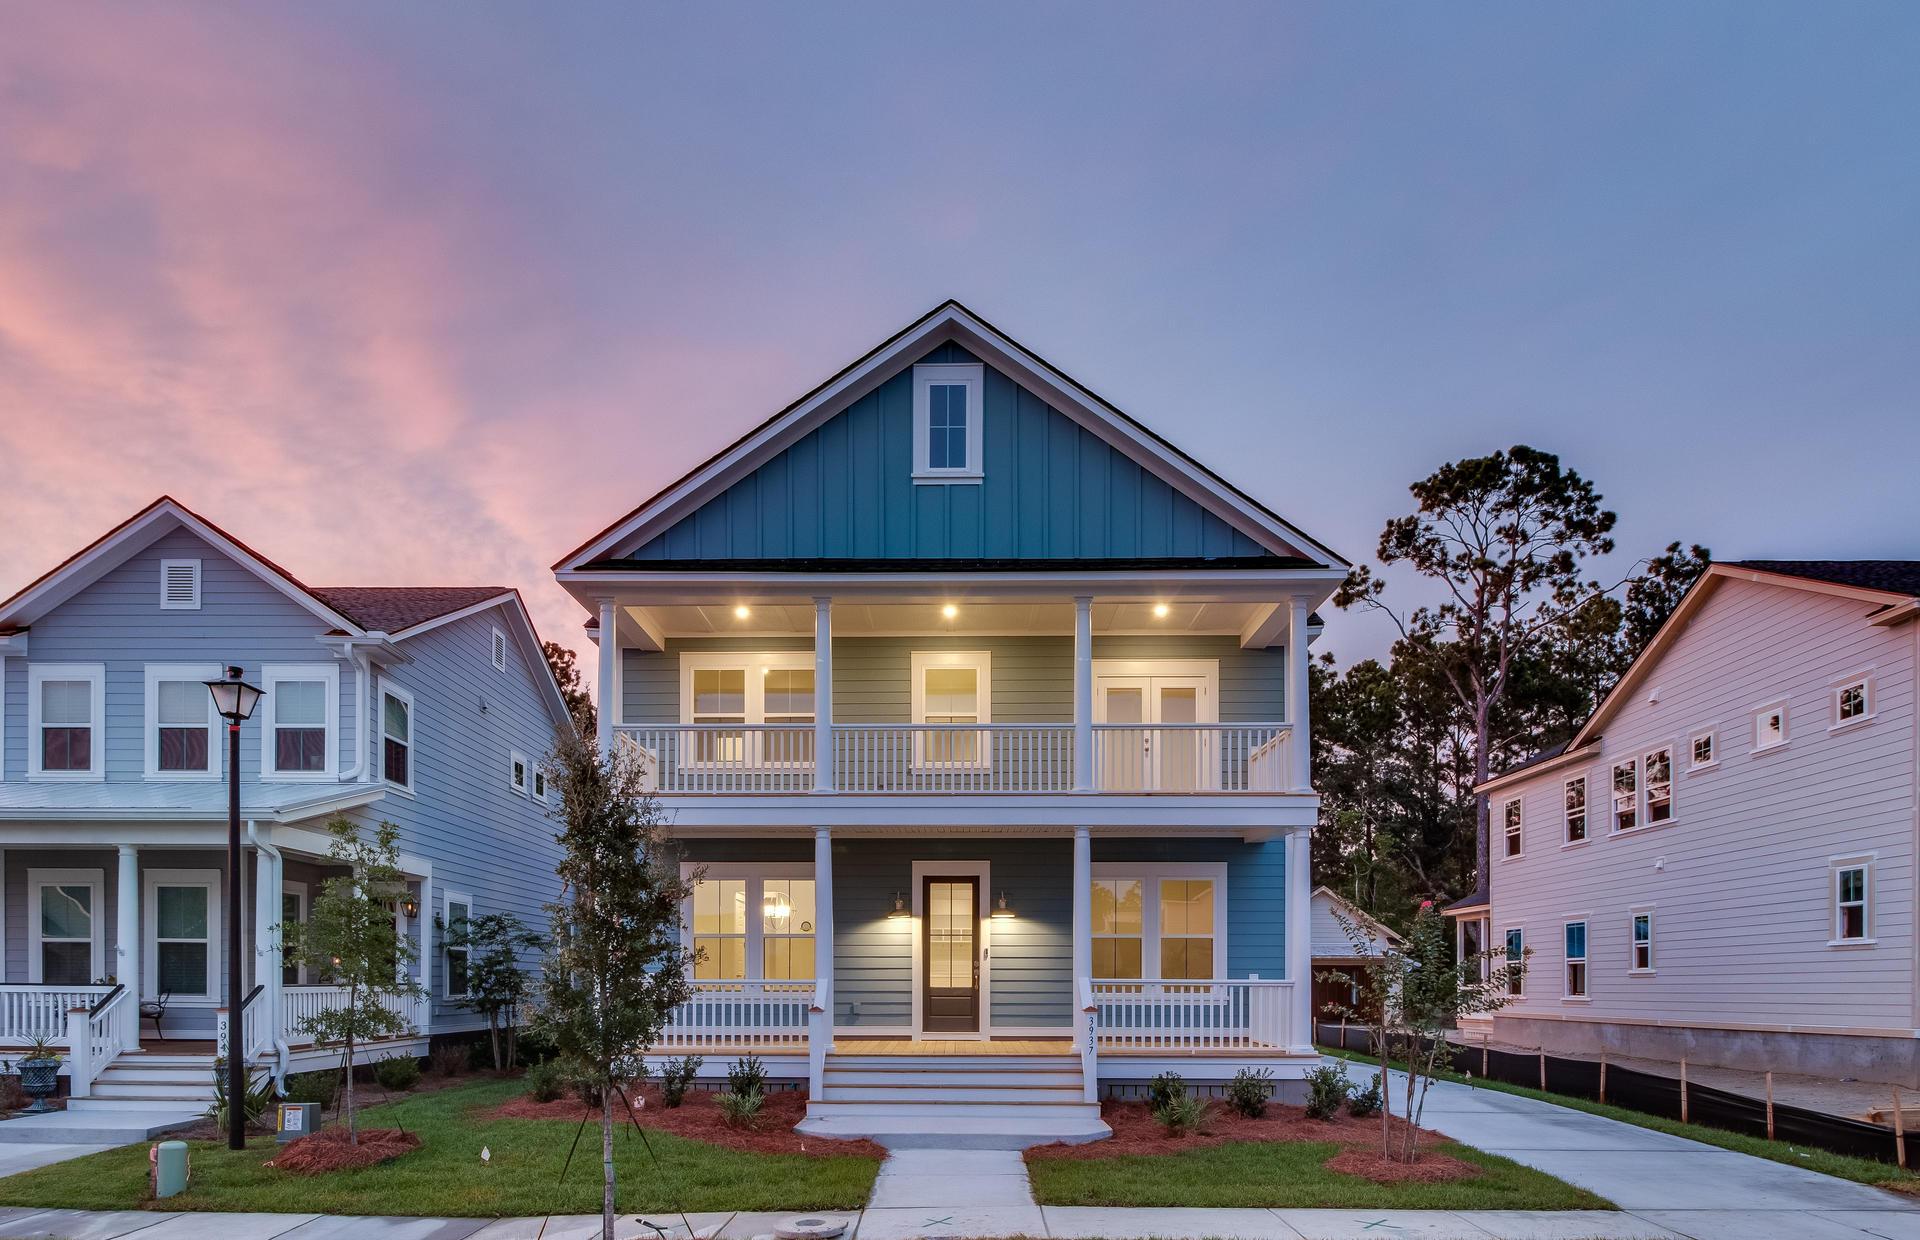 Carolina Park Homes For Sale - 1831 Agate Bay, Mount Pleasant, SC - 55